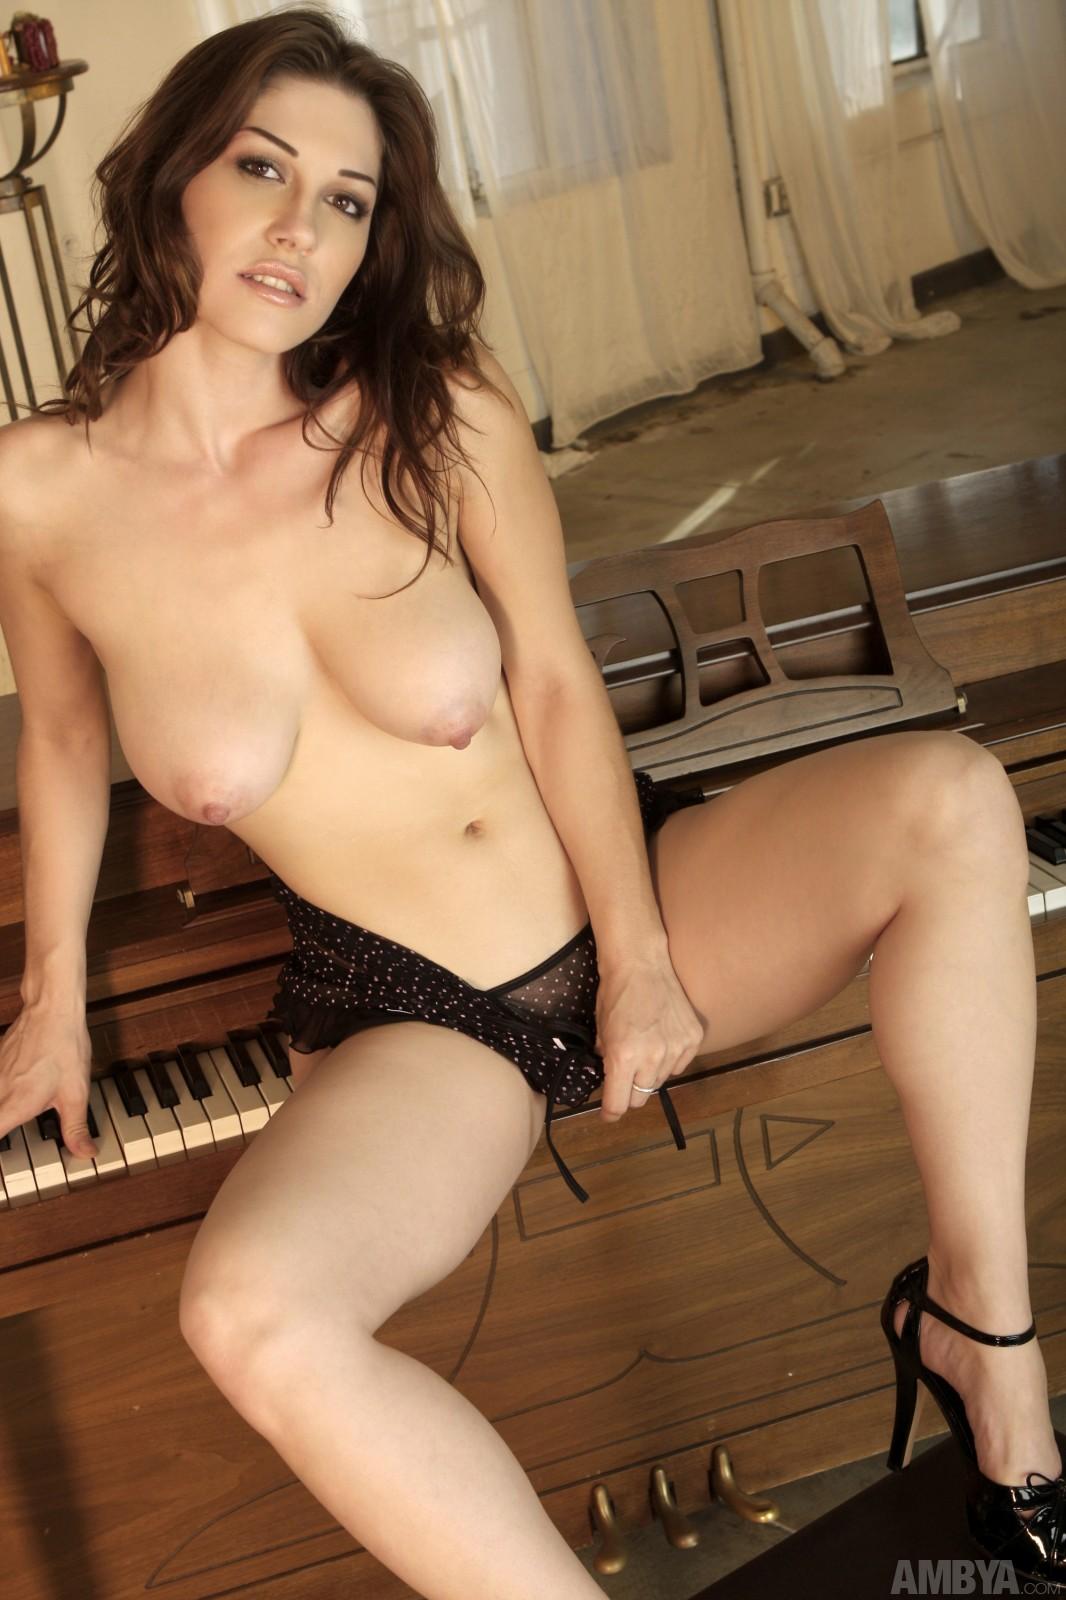 Photos of mature ladies with big boobs